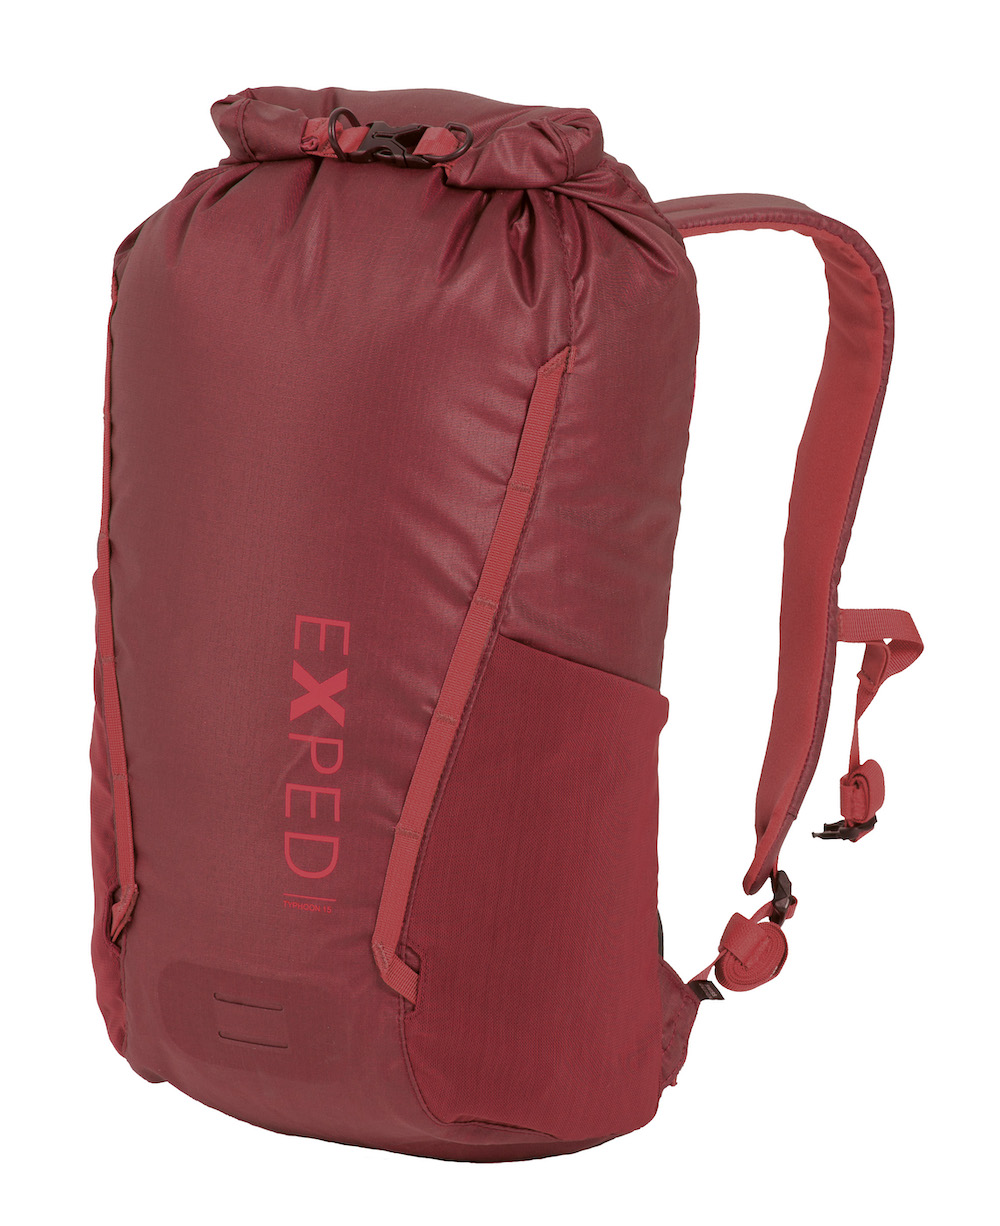 Exped - Typhoon 15, Einkammer-Packsack